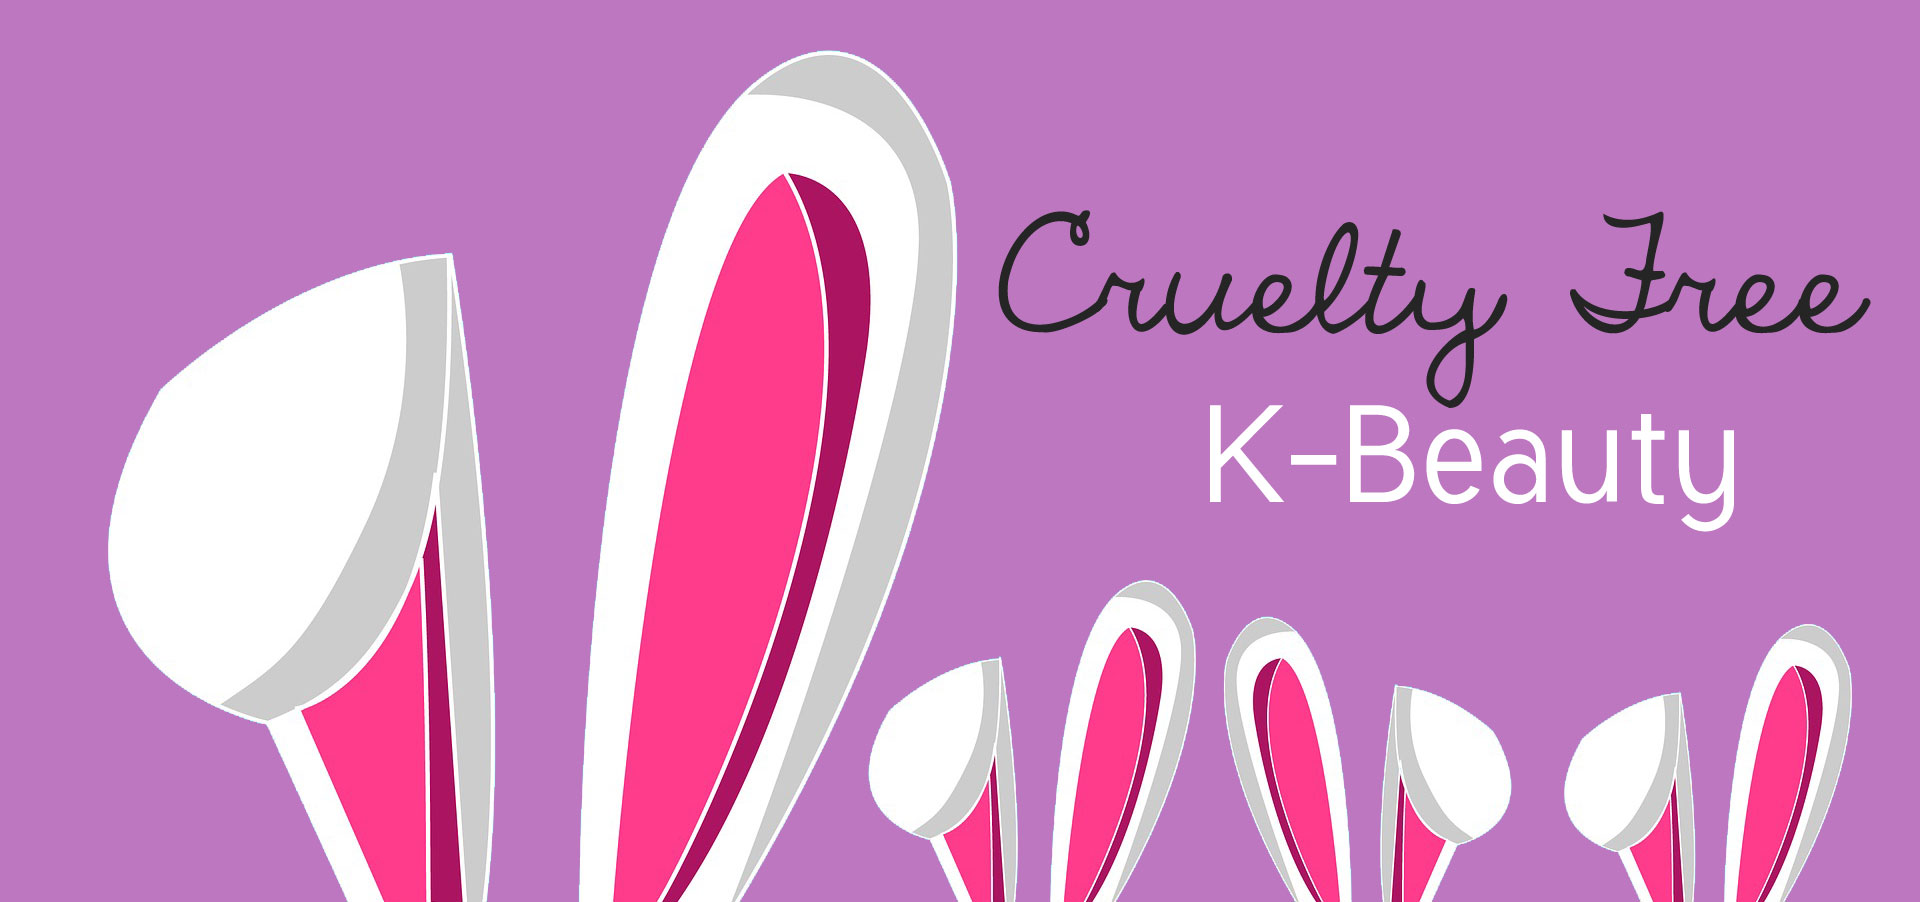 Banner Cruelty Free K-Beauty